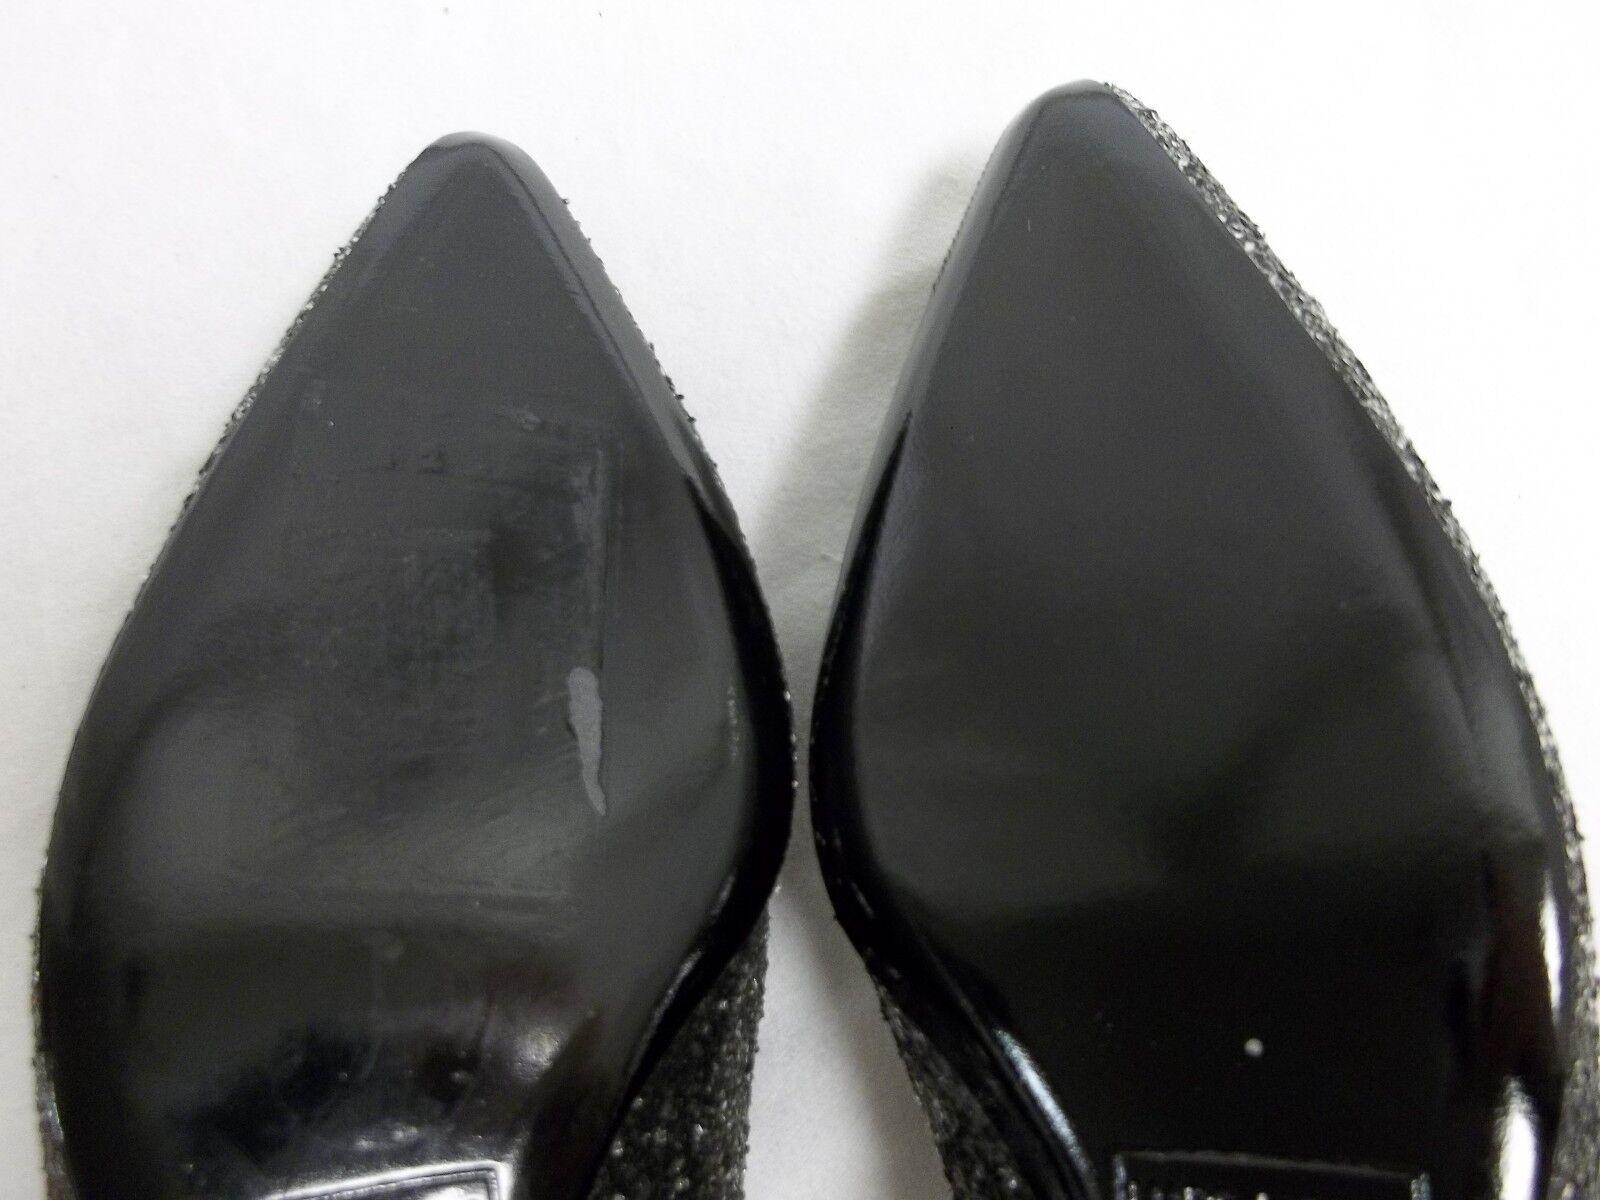 Marc Jacobs Jacobs Marc Größe EU 36 US 6 M MJ21093 Silver Leder Flats New Damenschuhe Schuhes 7cf943